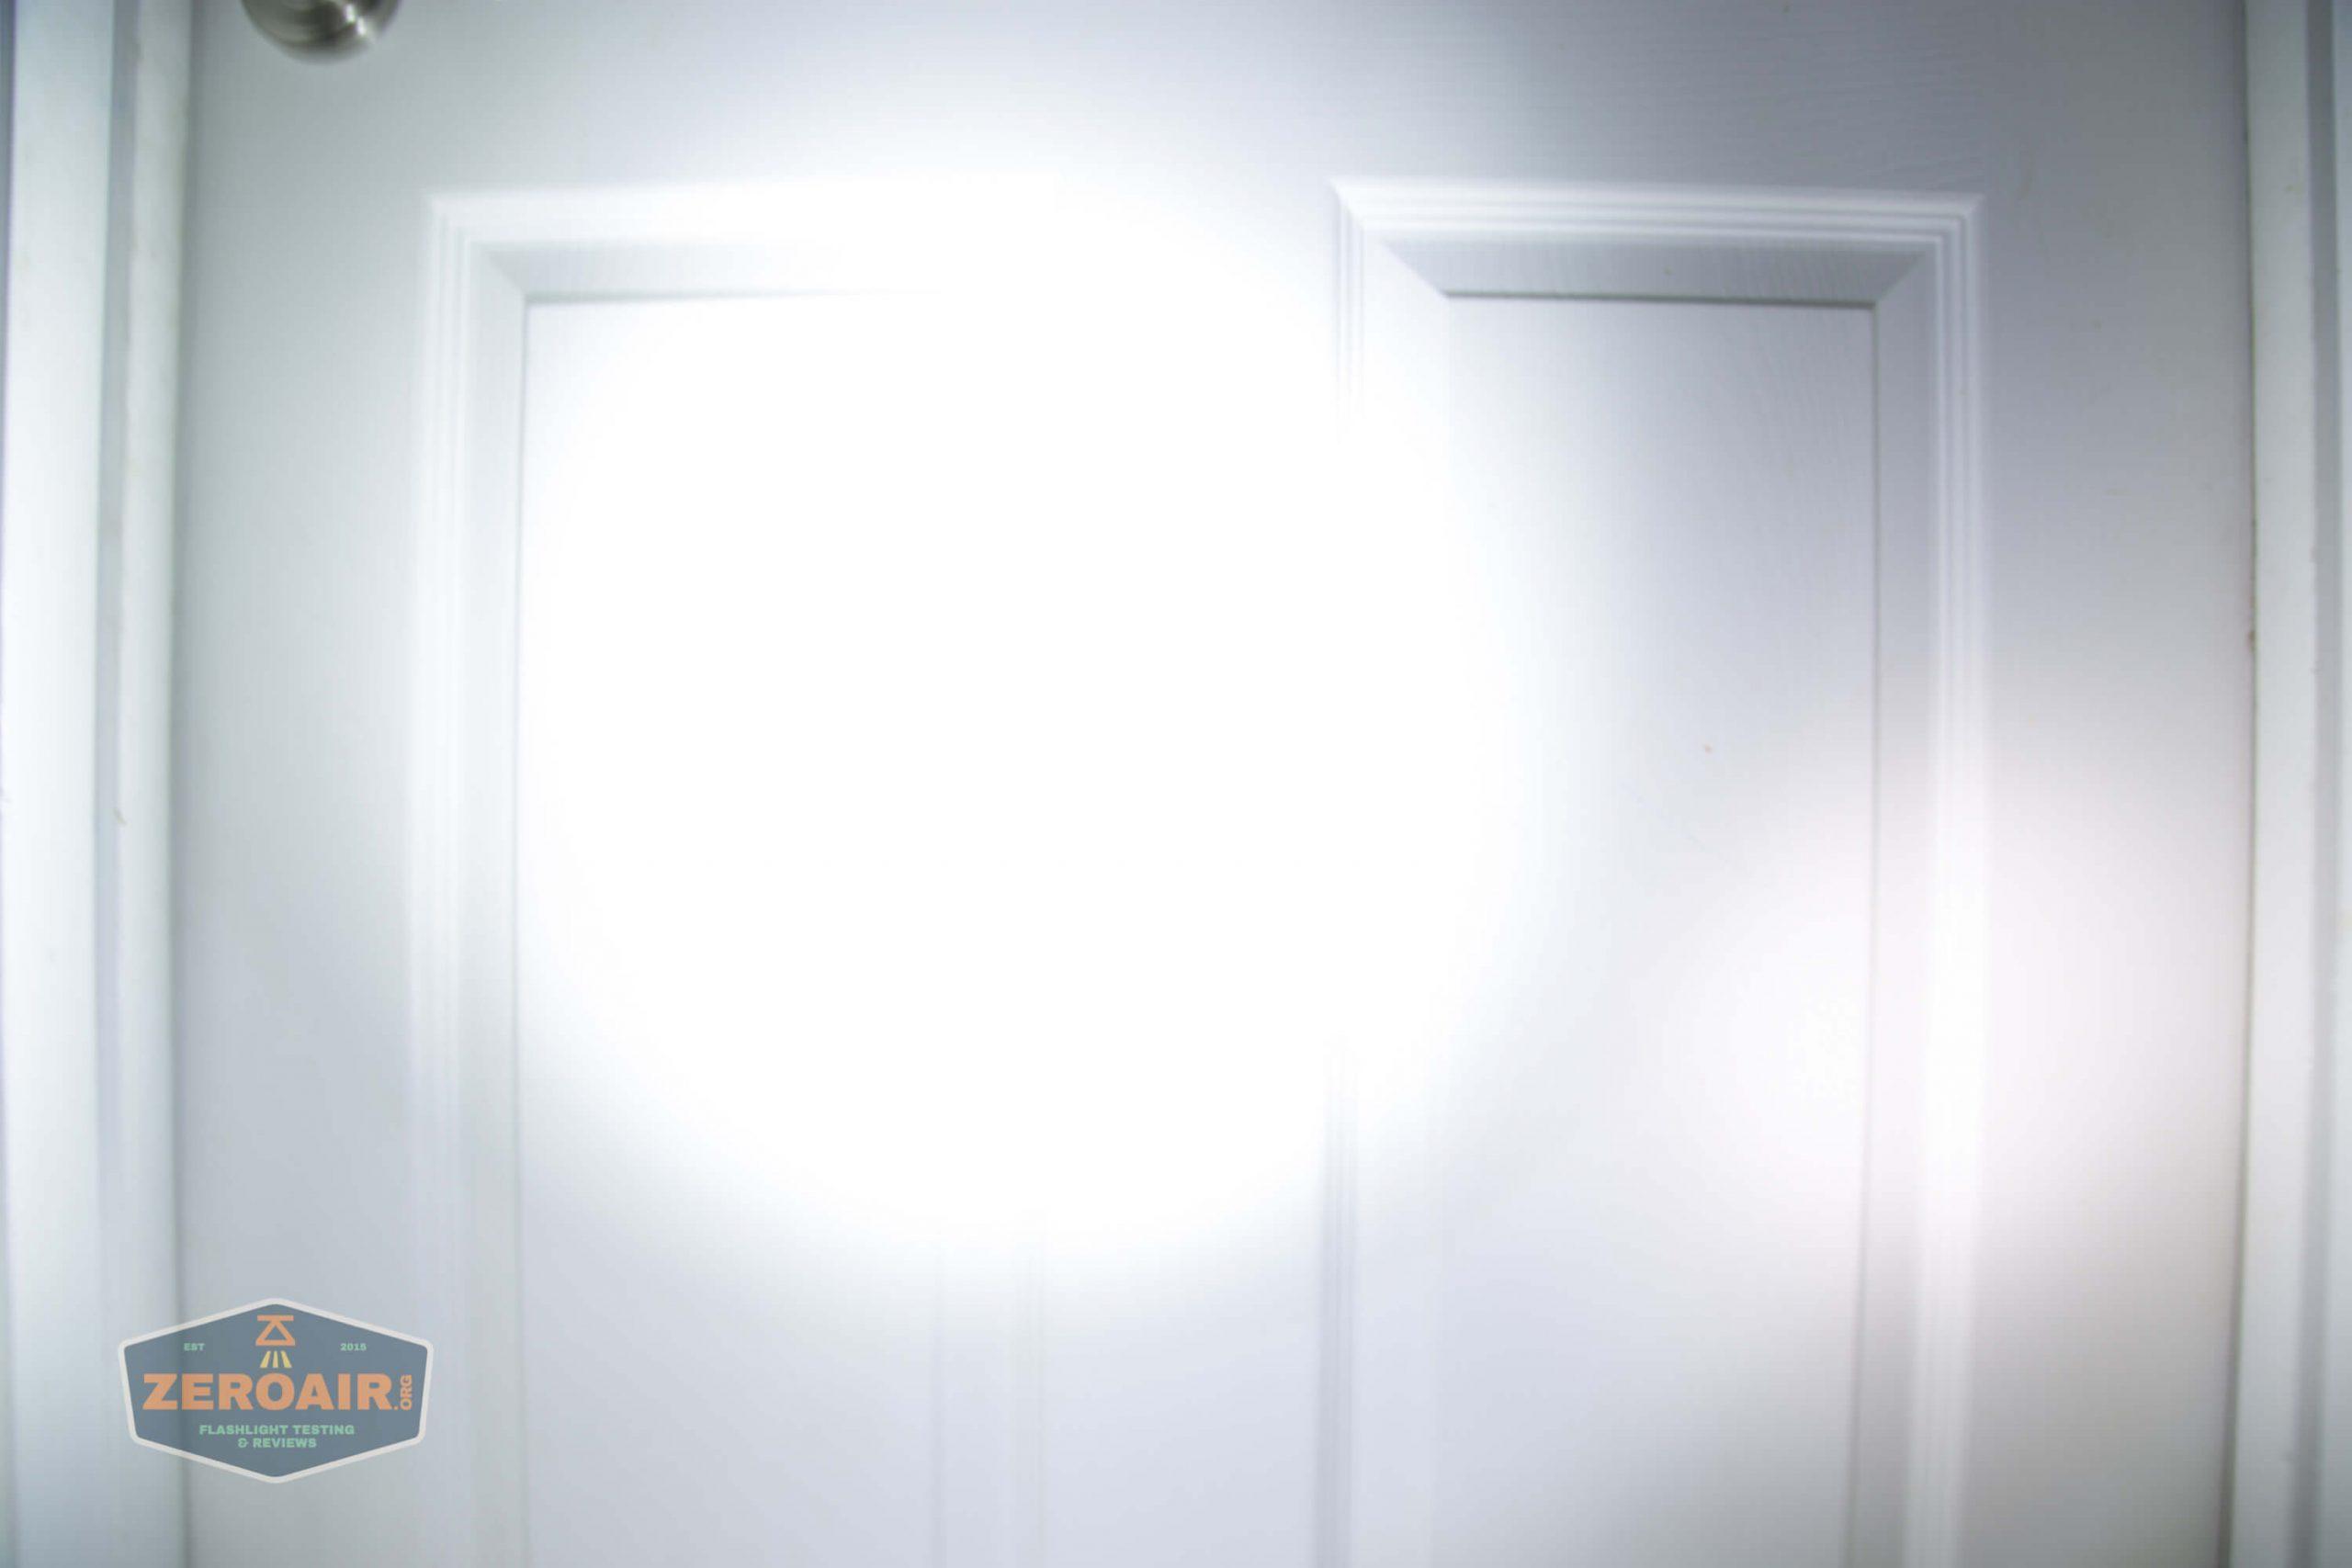 fireflylite e01 luminus sst-40 21700 beamshot door vs blf-348 8